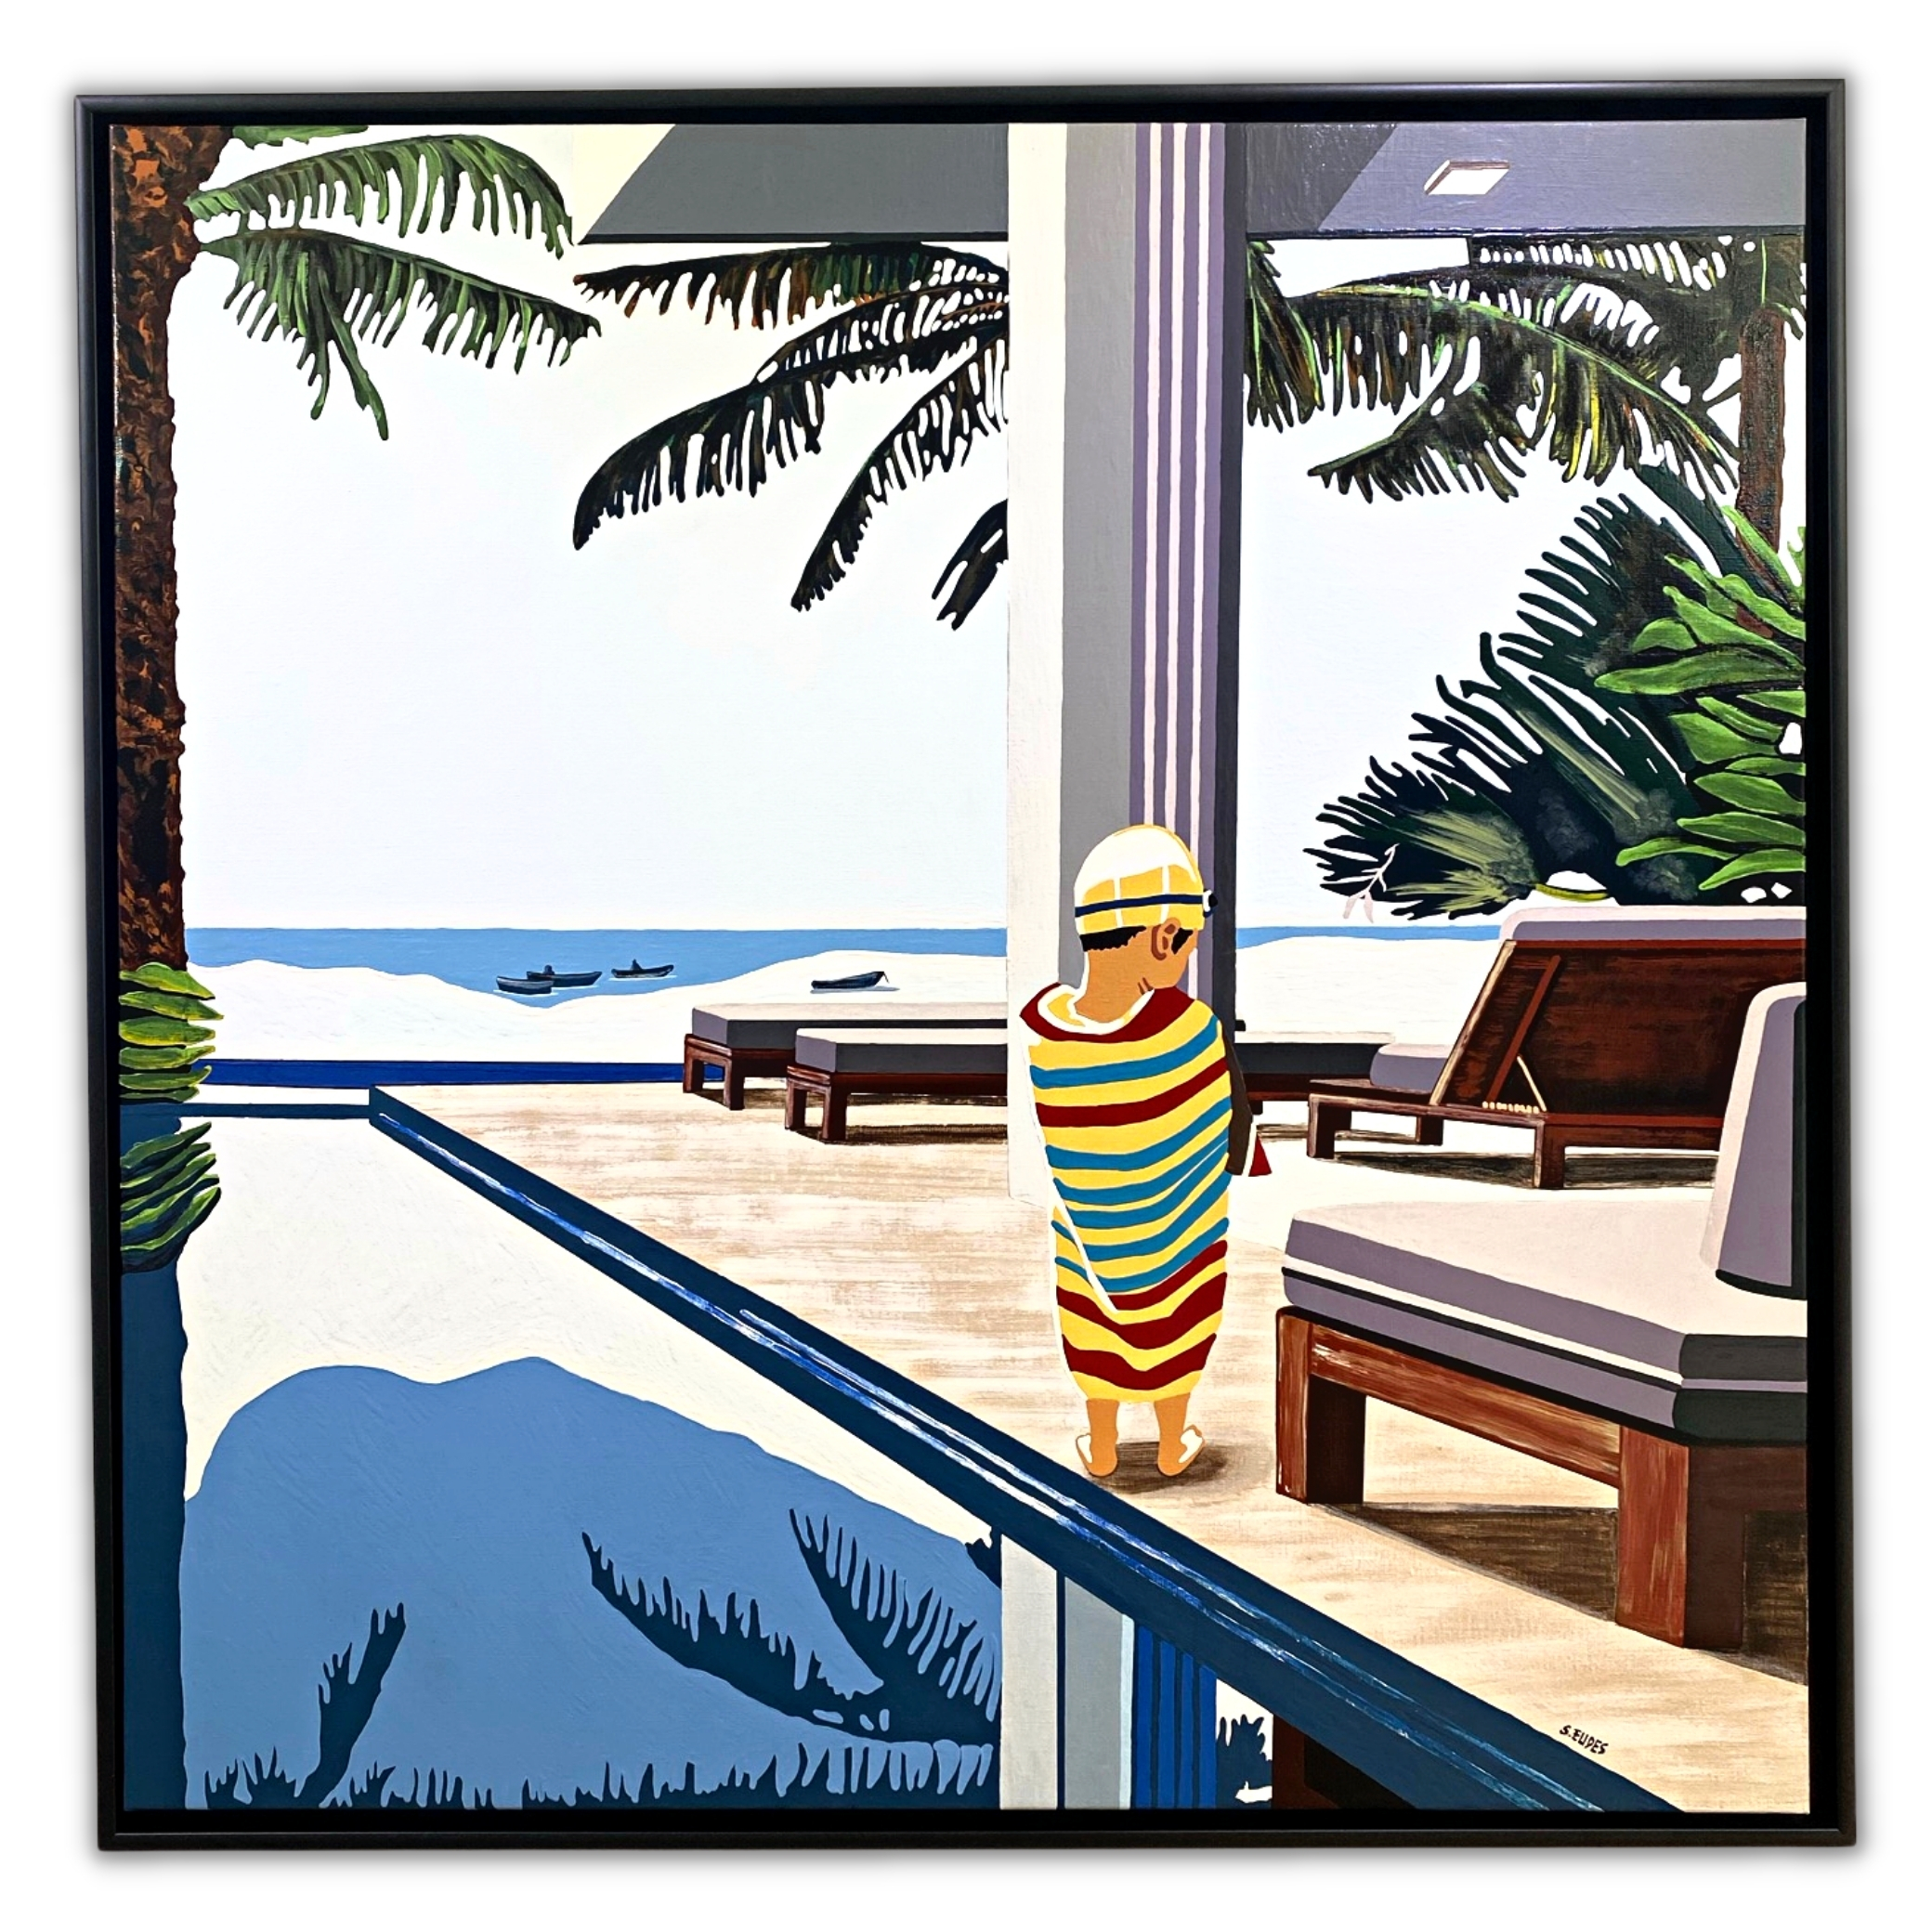 Range-of-Arts-Sylvie-Eudes-Ete-Indien-100-100-s